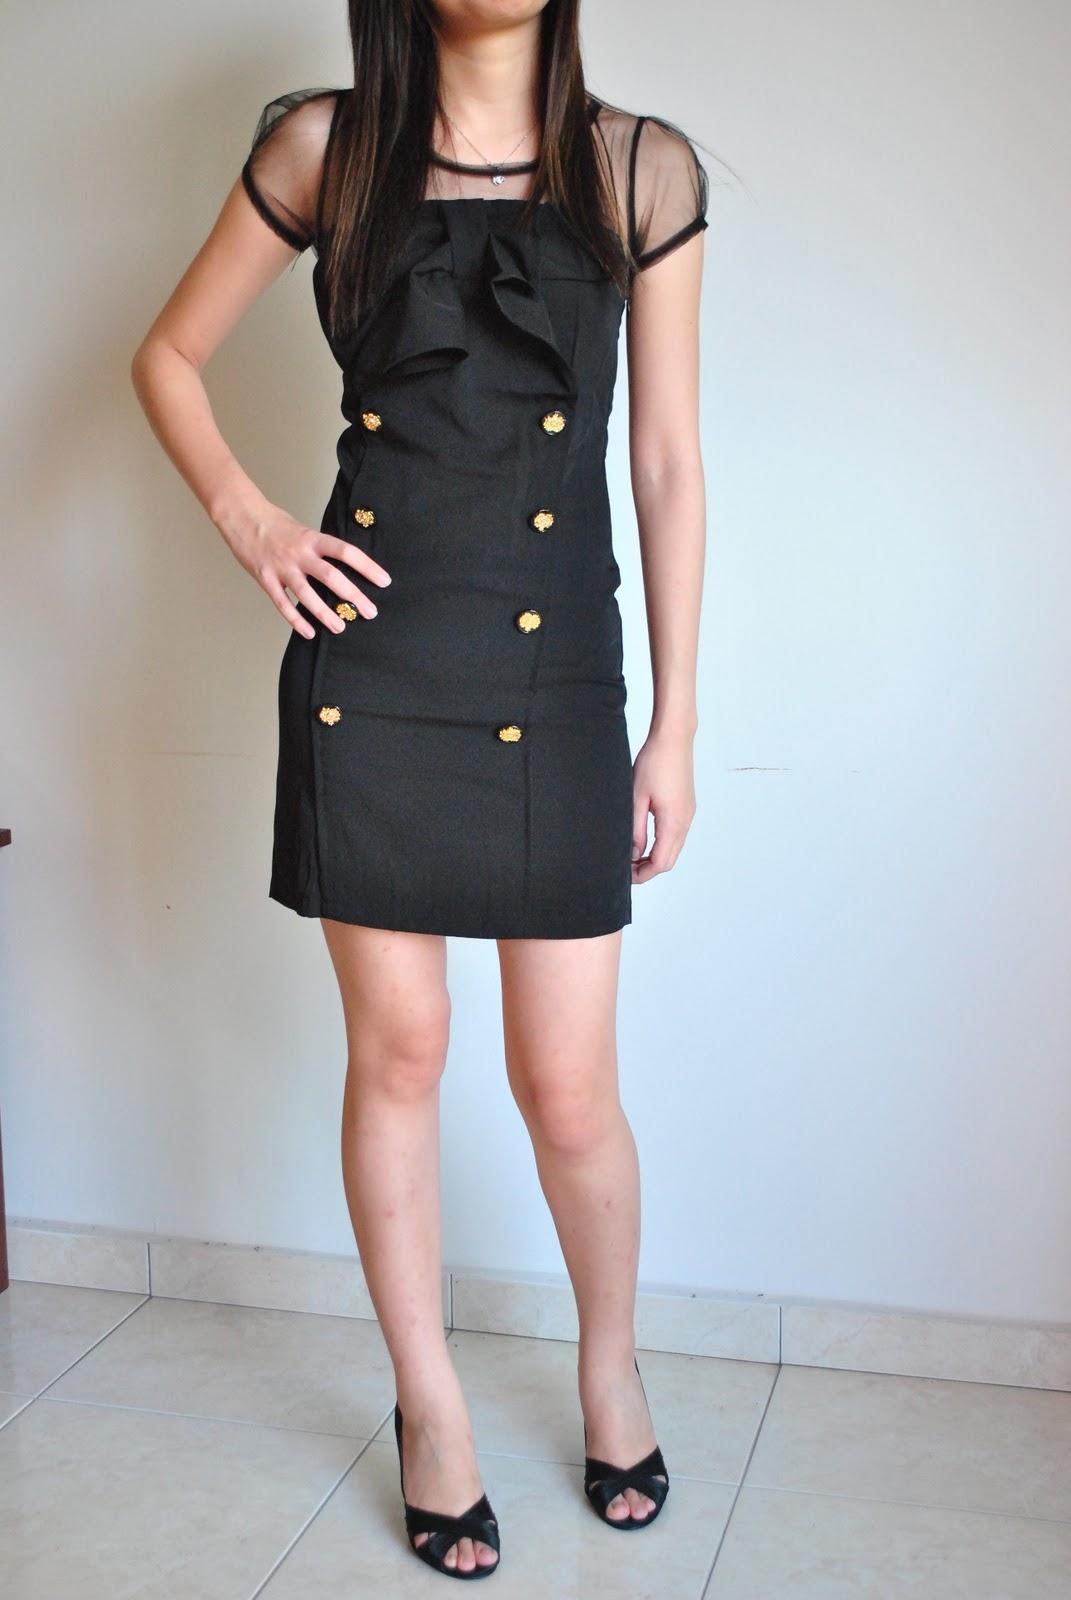 Le'glamour: Nice dress